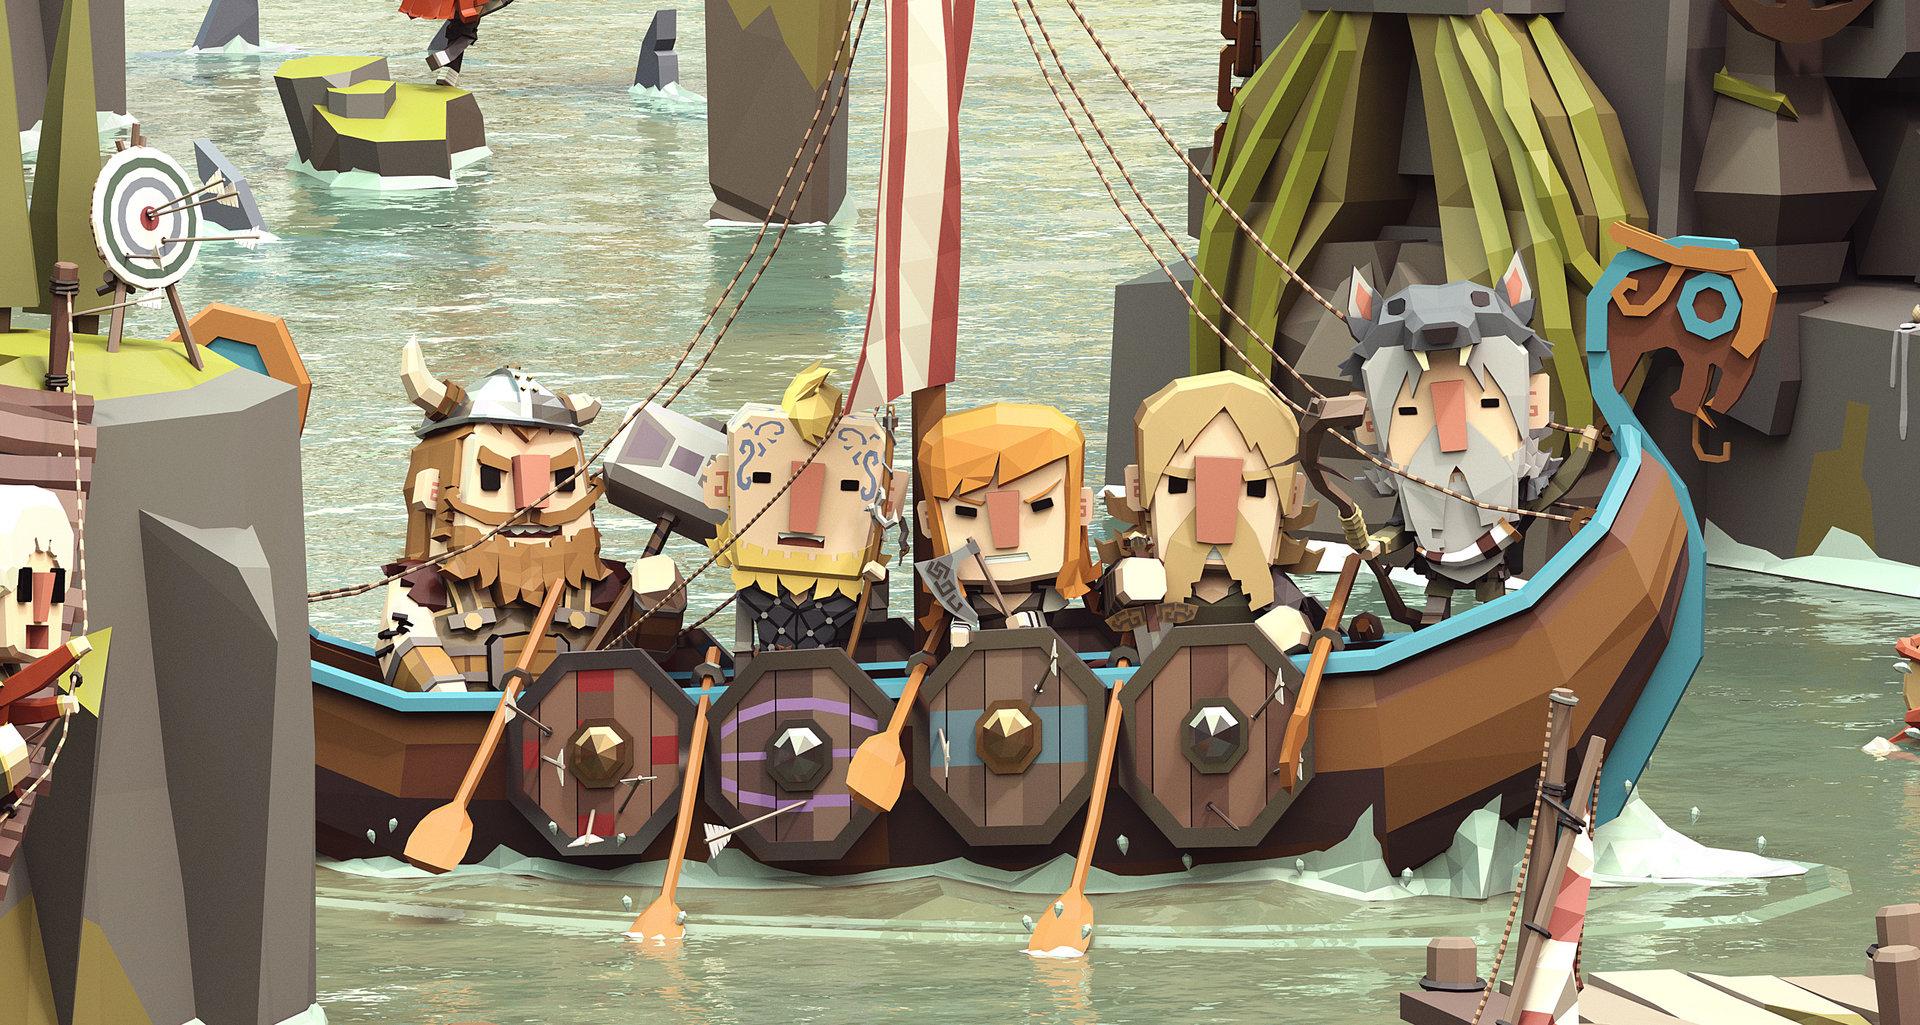 ArtStation - Viking Life, ben regimbal